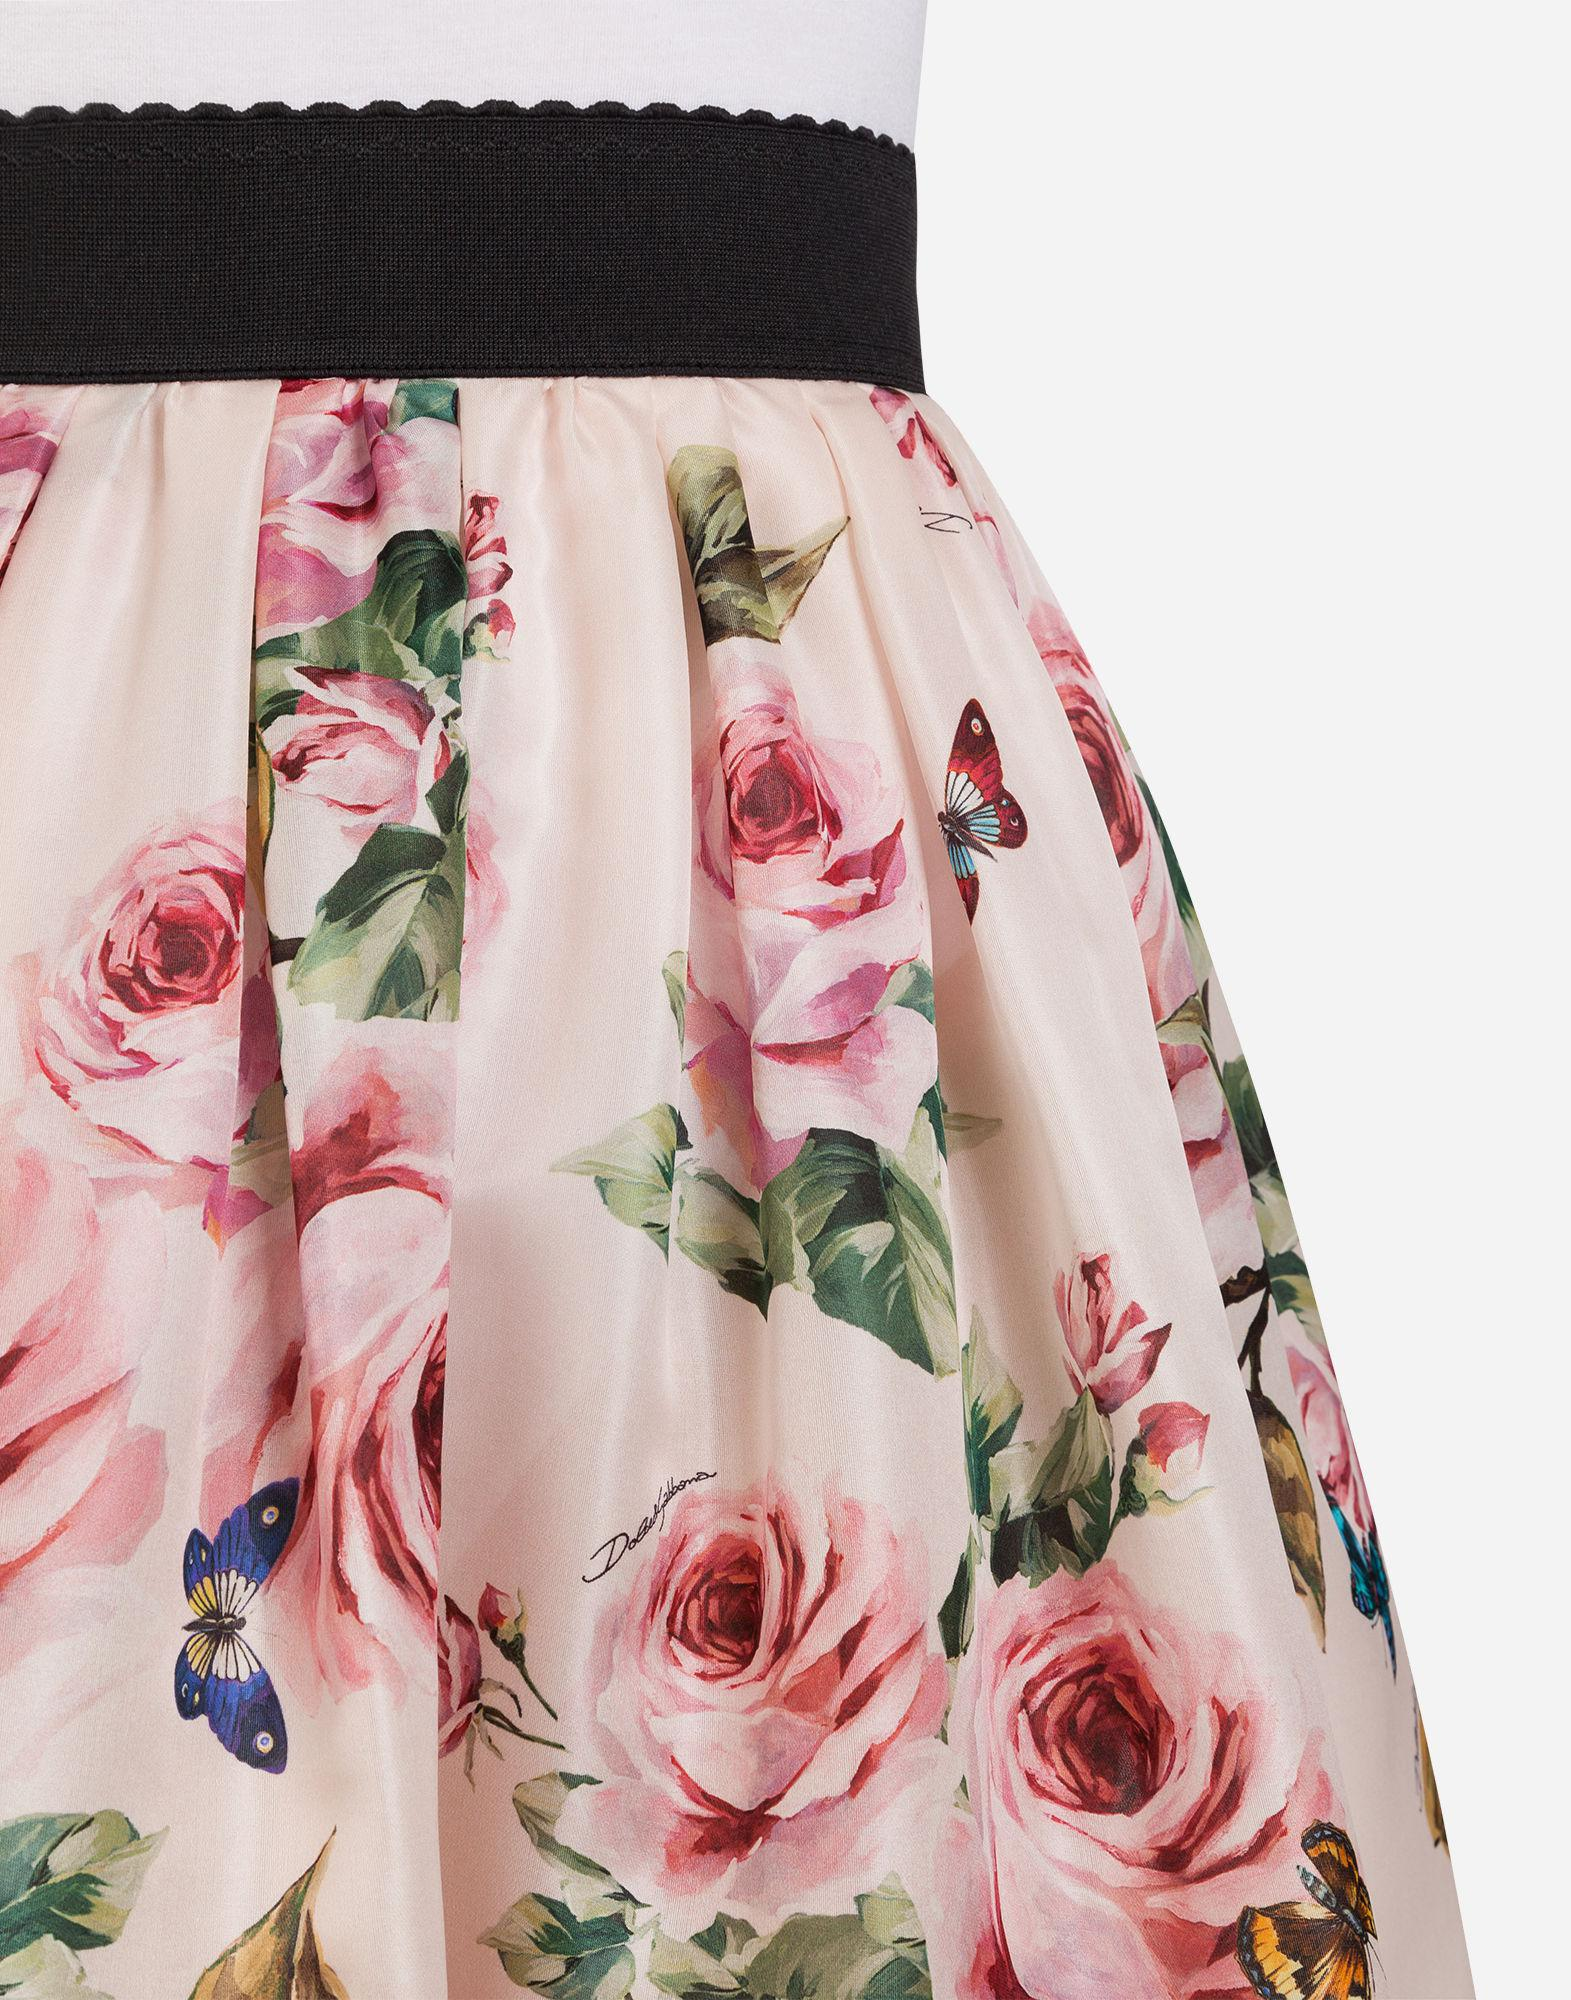 bfc1f36e897d Lyst - Dolce & Gabbana Silk Organza Print Full Skirt in Pink